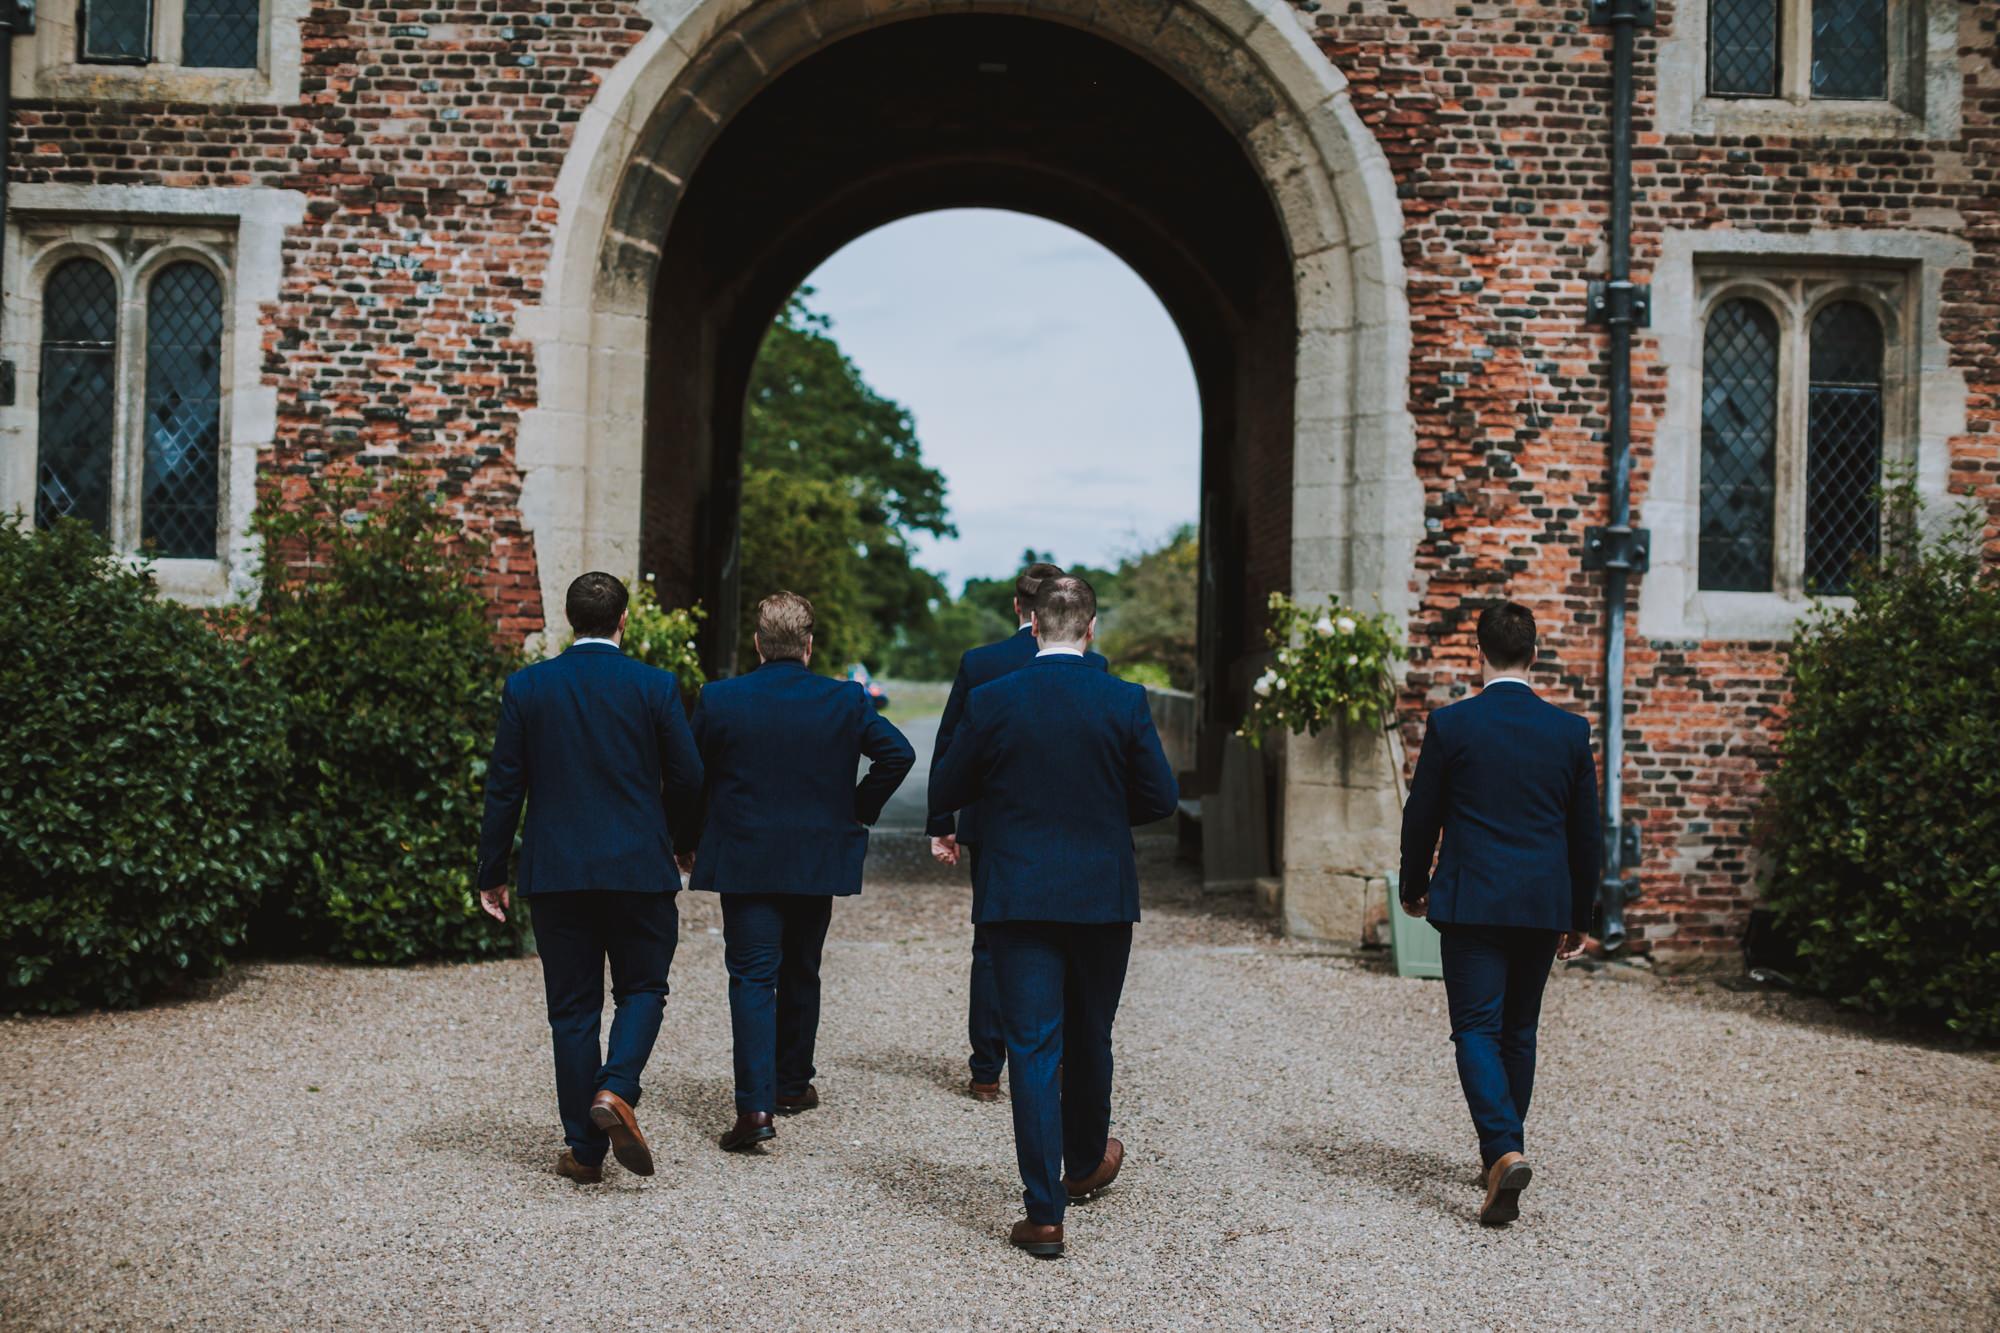 hodsock priory wedding photographers blog15.jpg